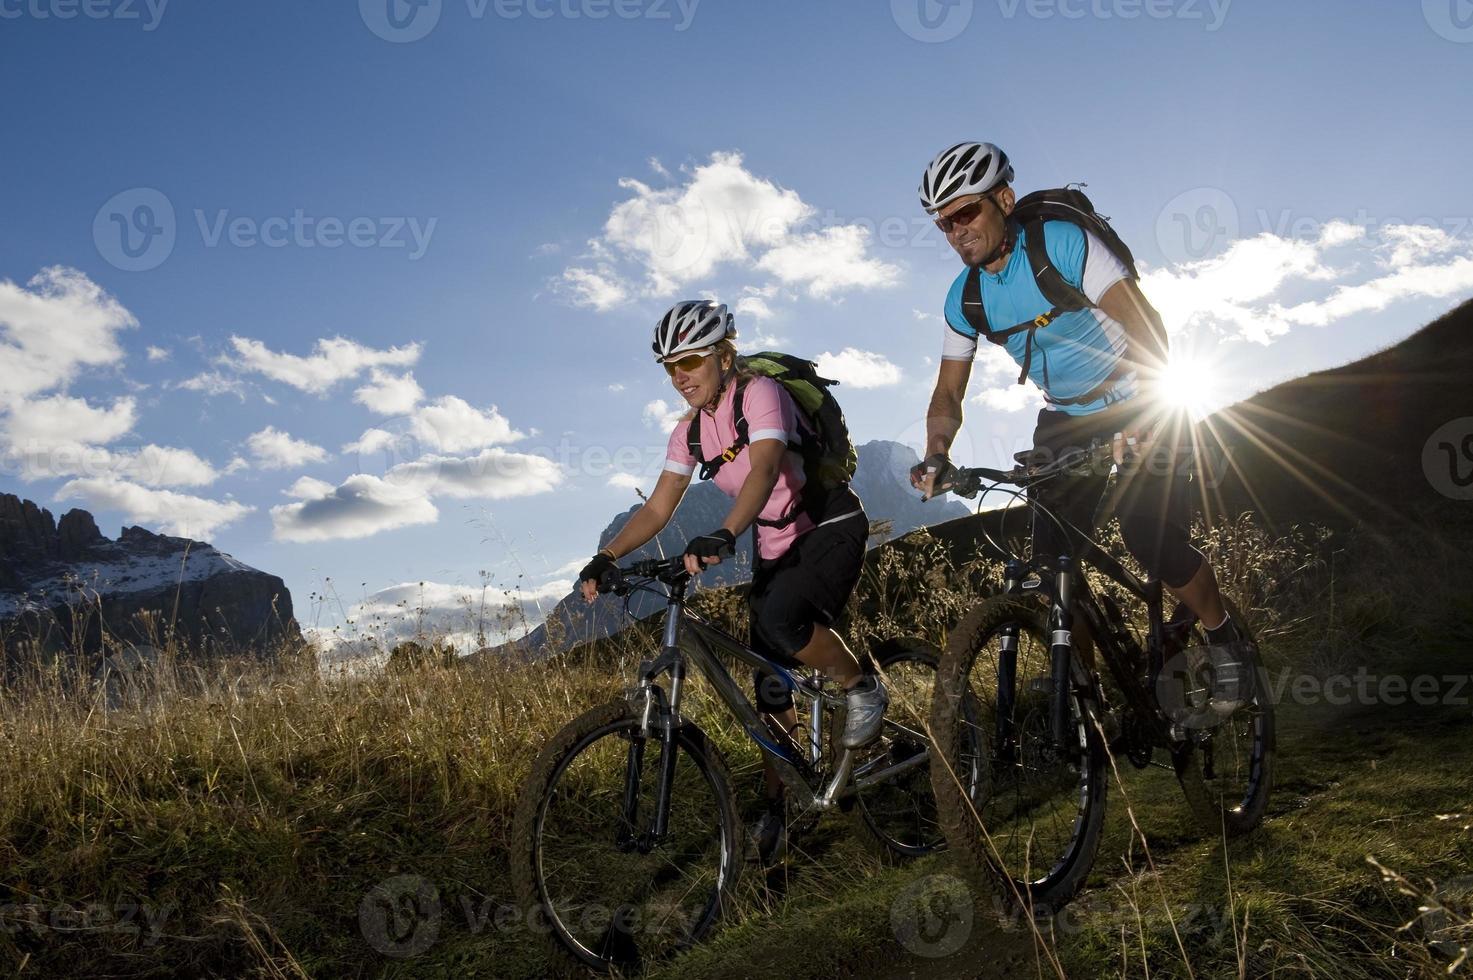 alegria do esporte de mountain bike foto